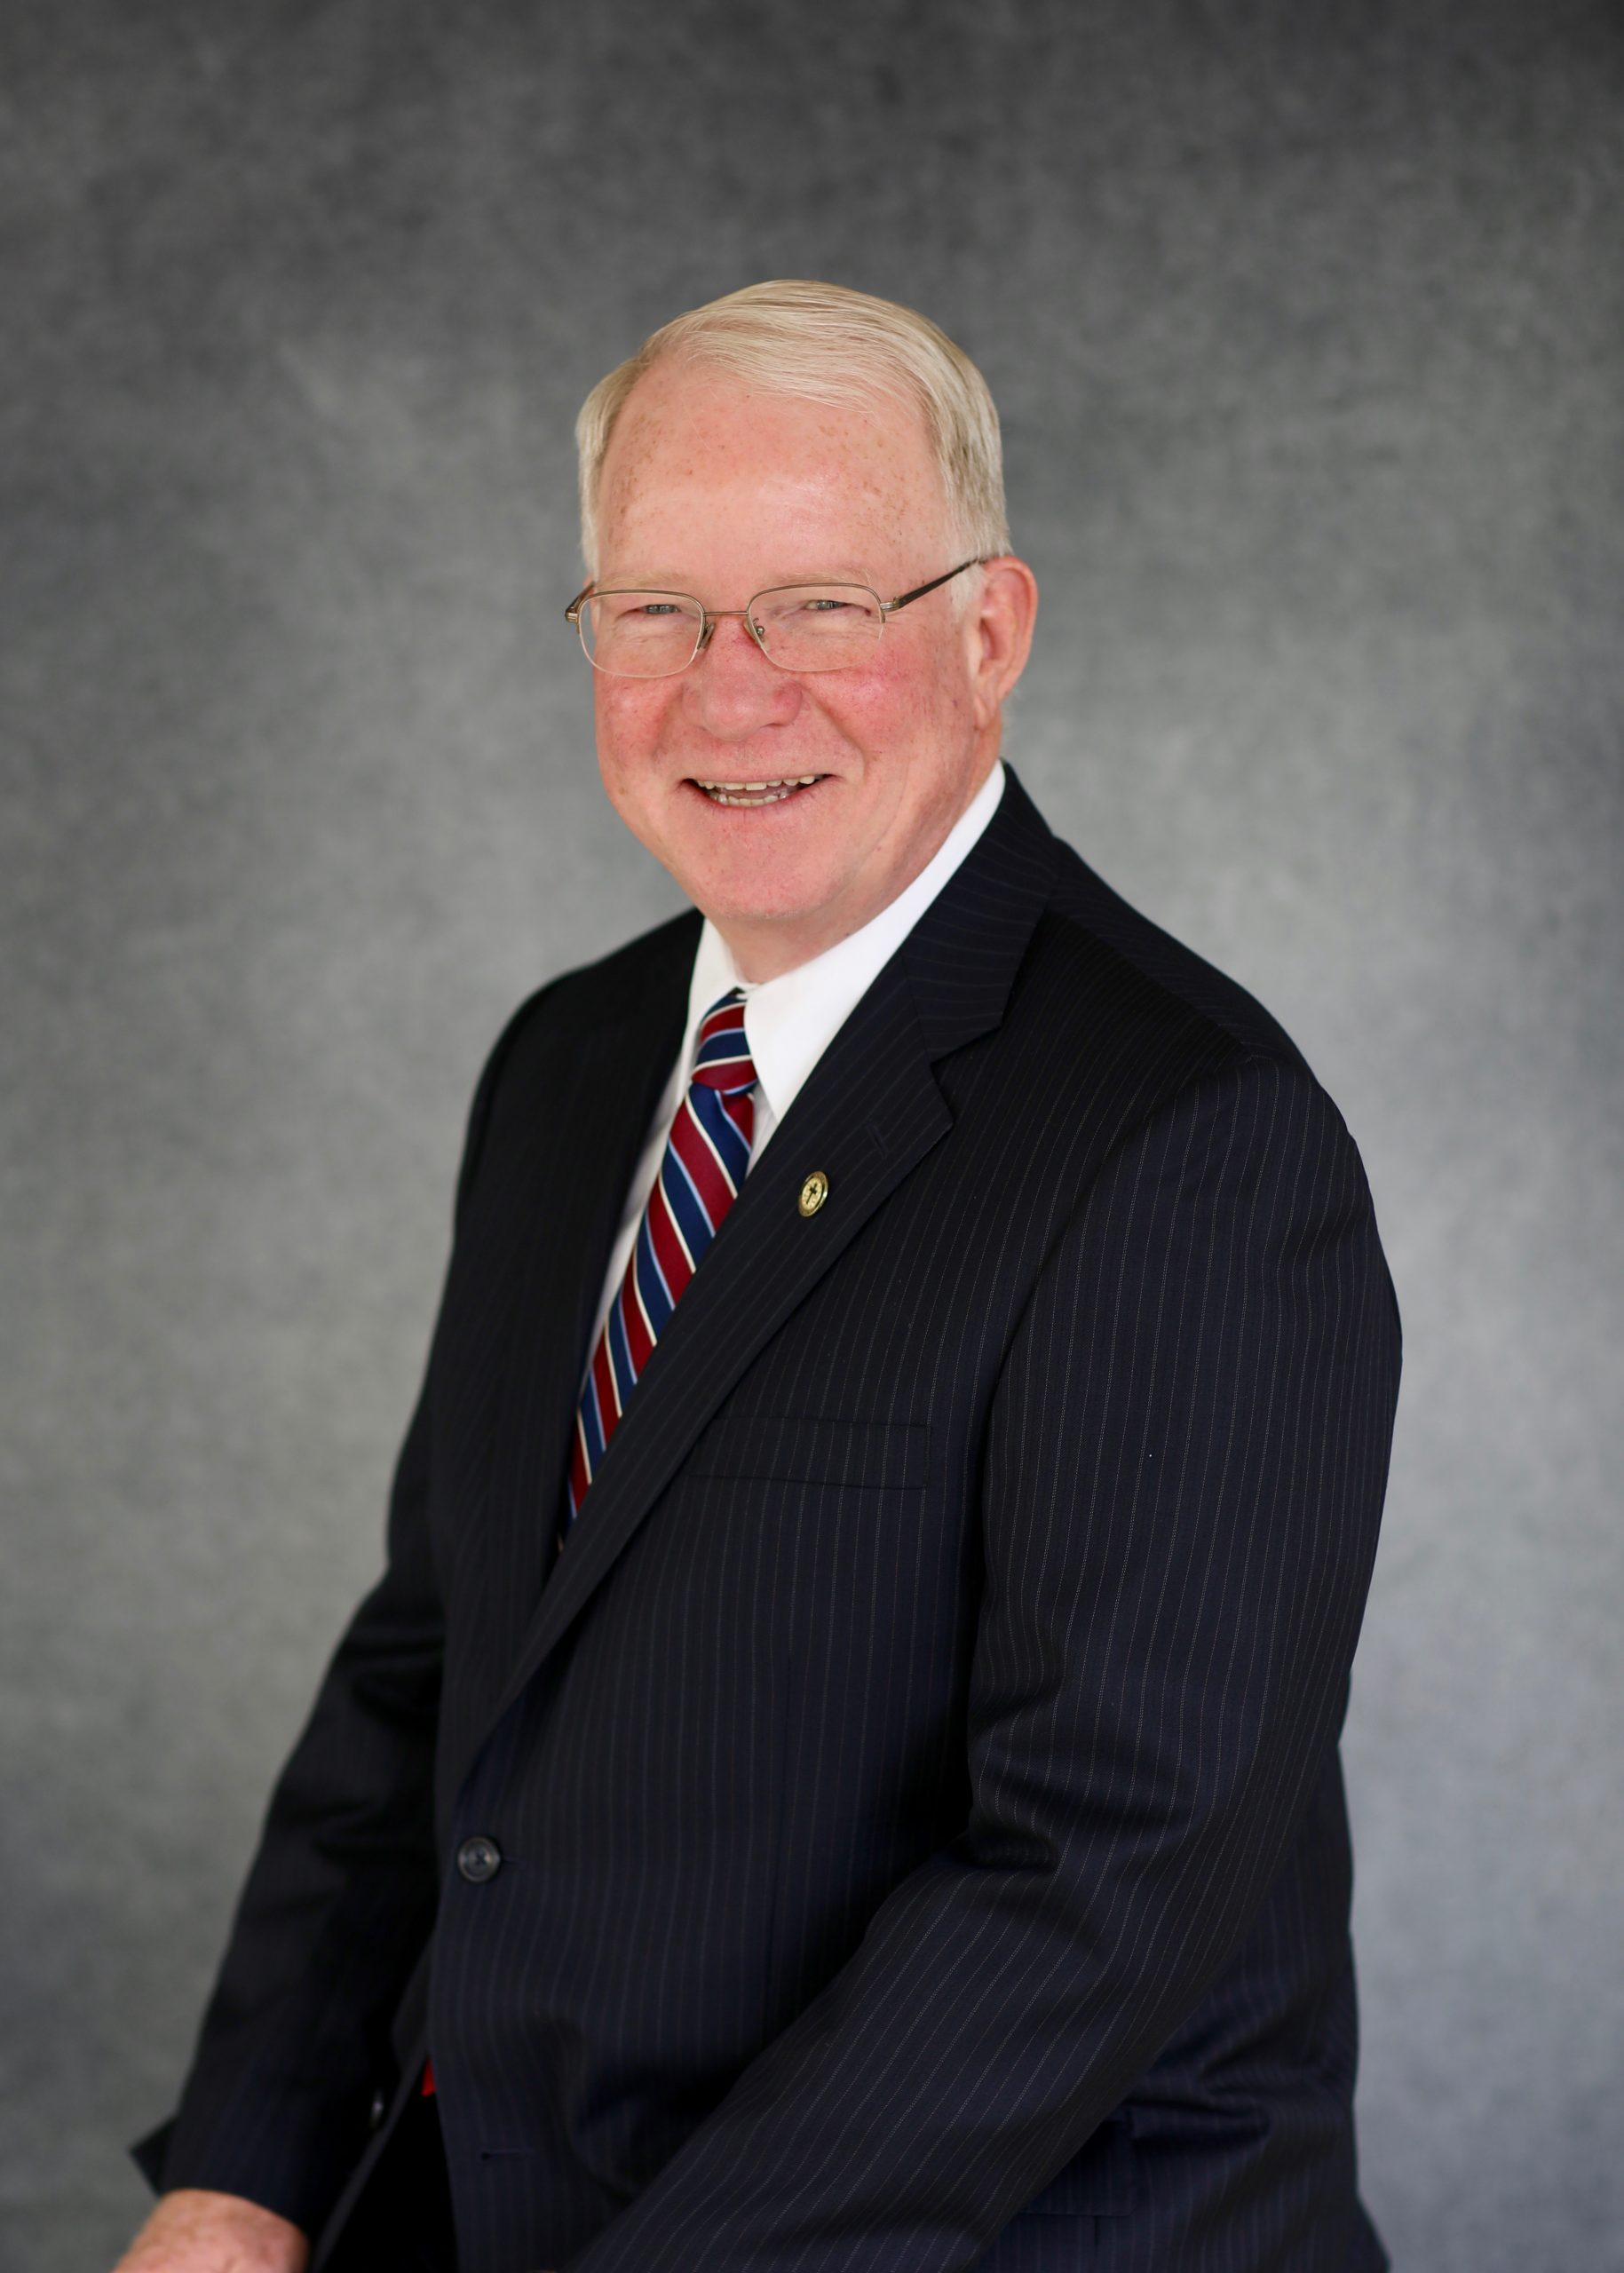 BJ Hickert 2018